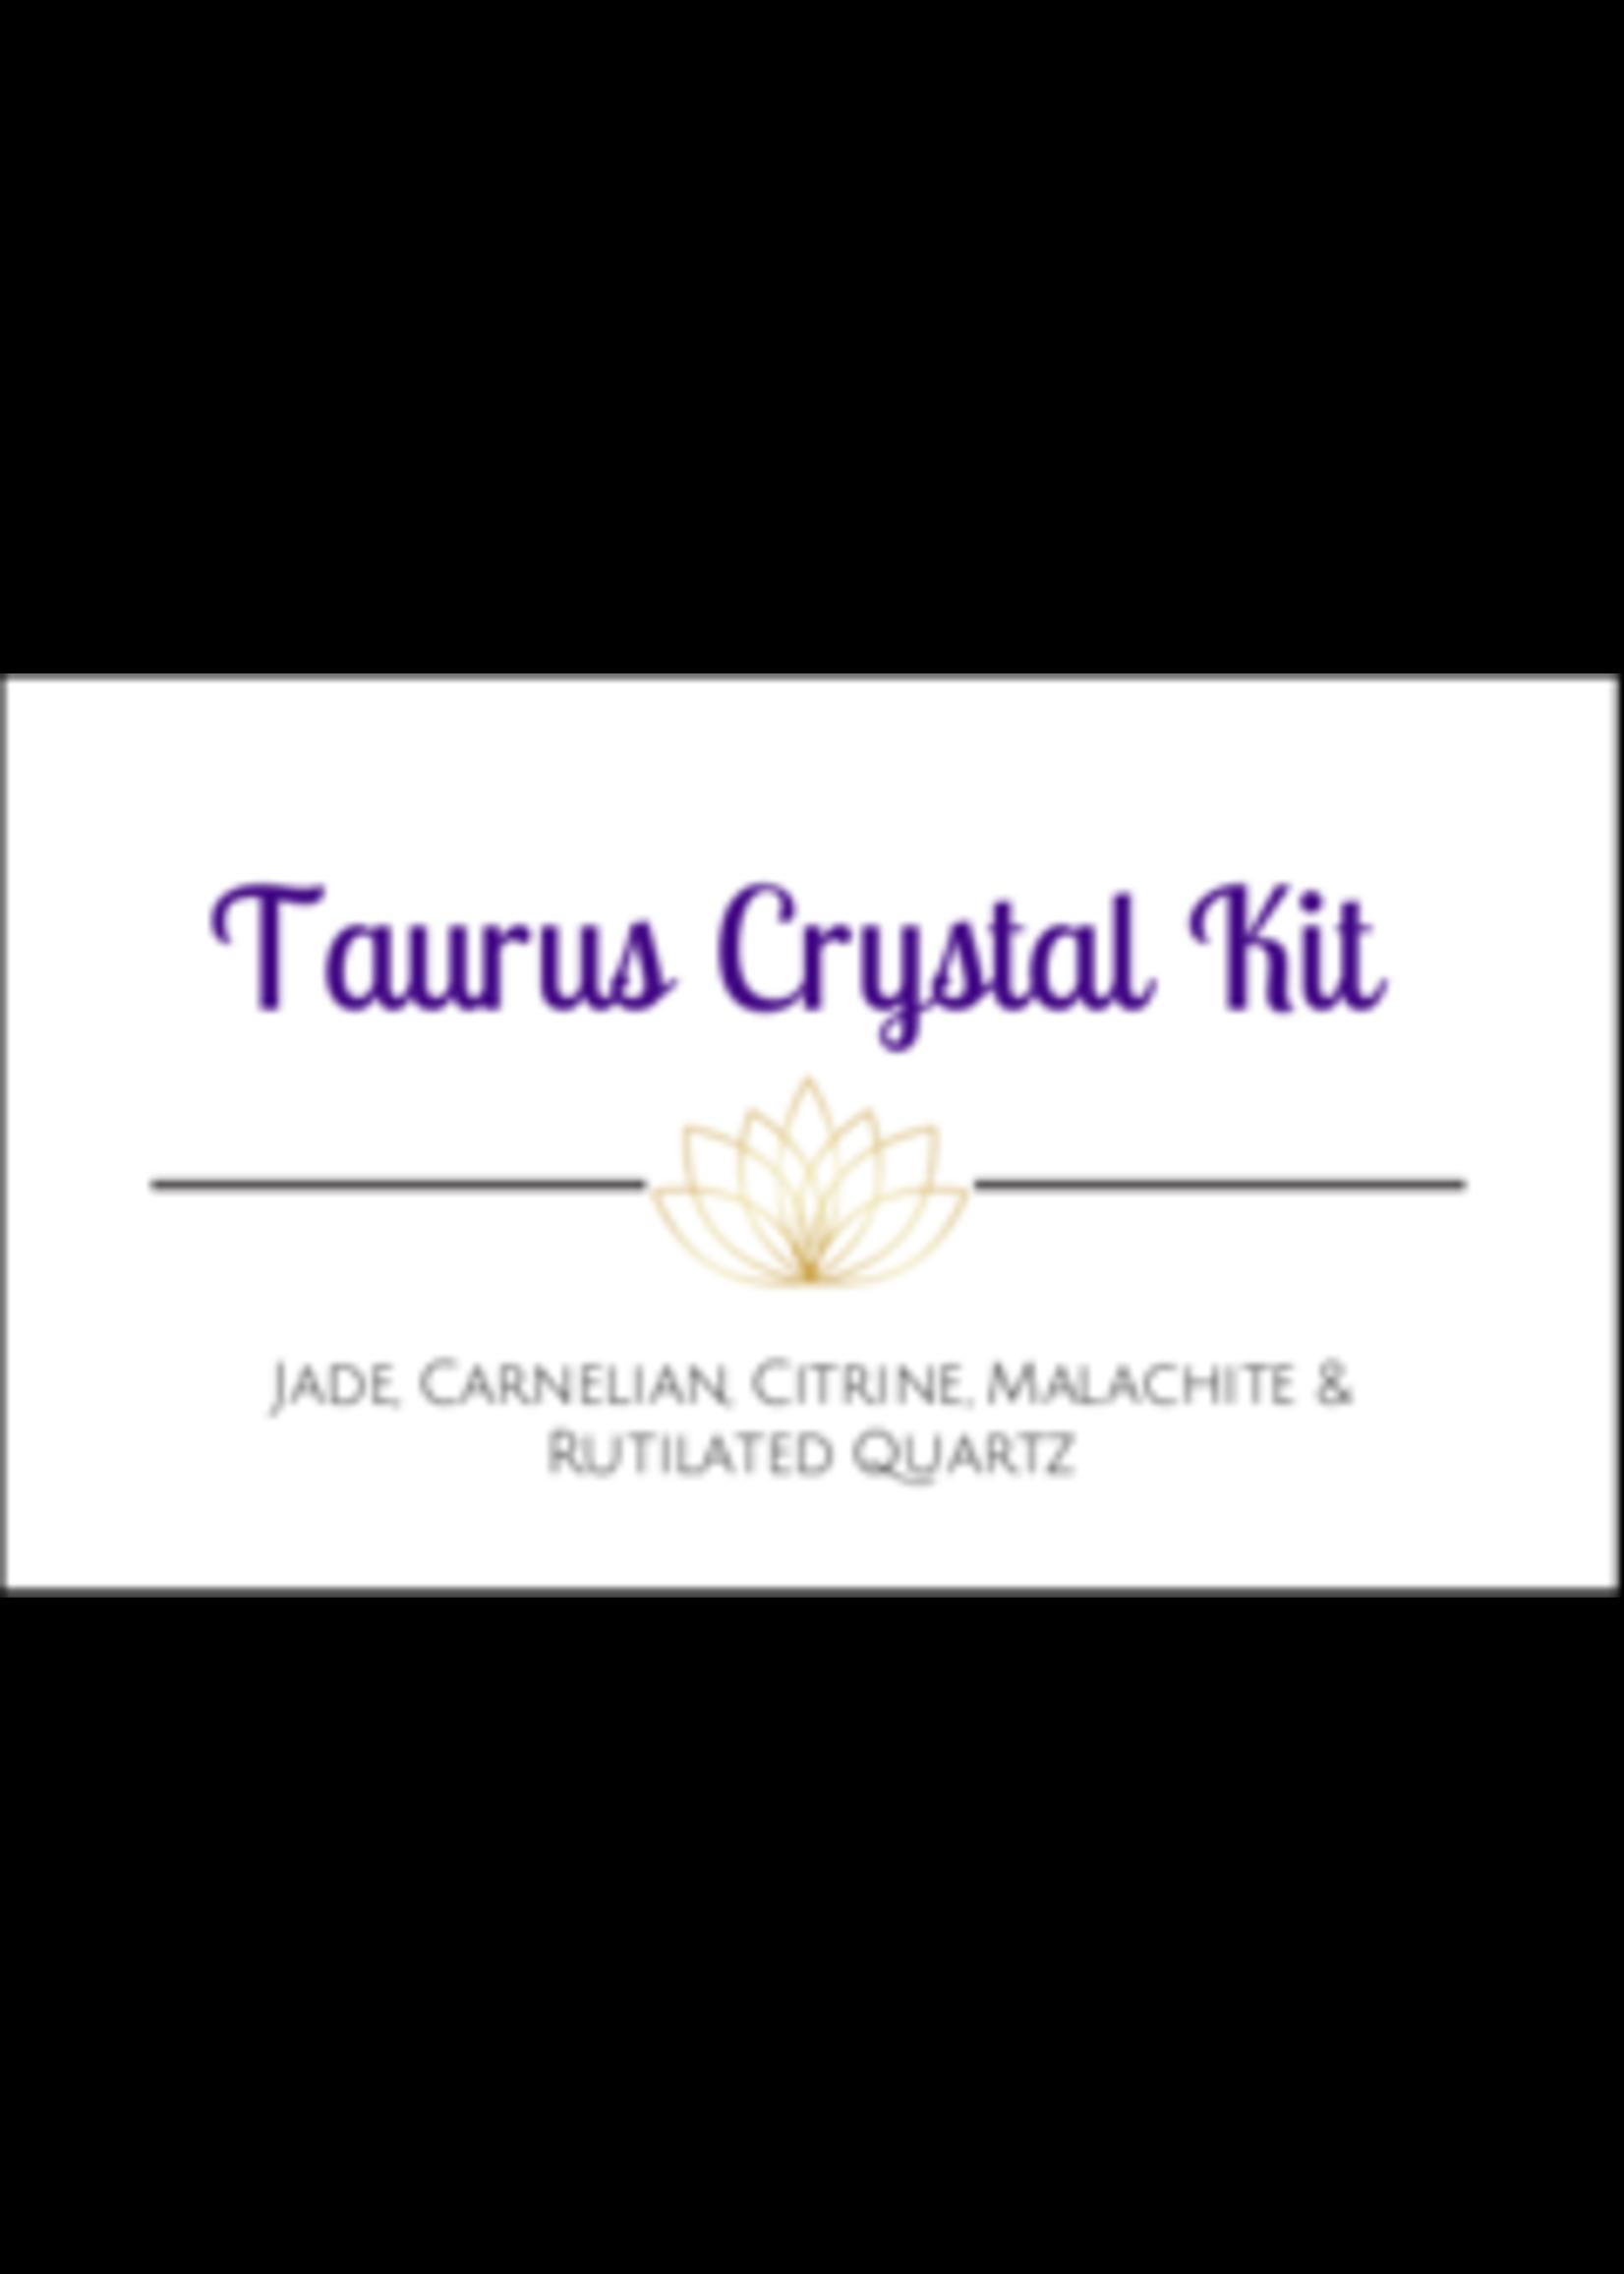 Taurus Zodiac Crystal Kit Cards - Box of 100